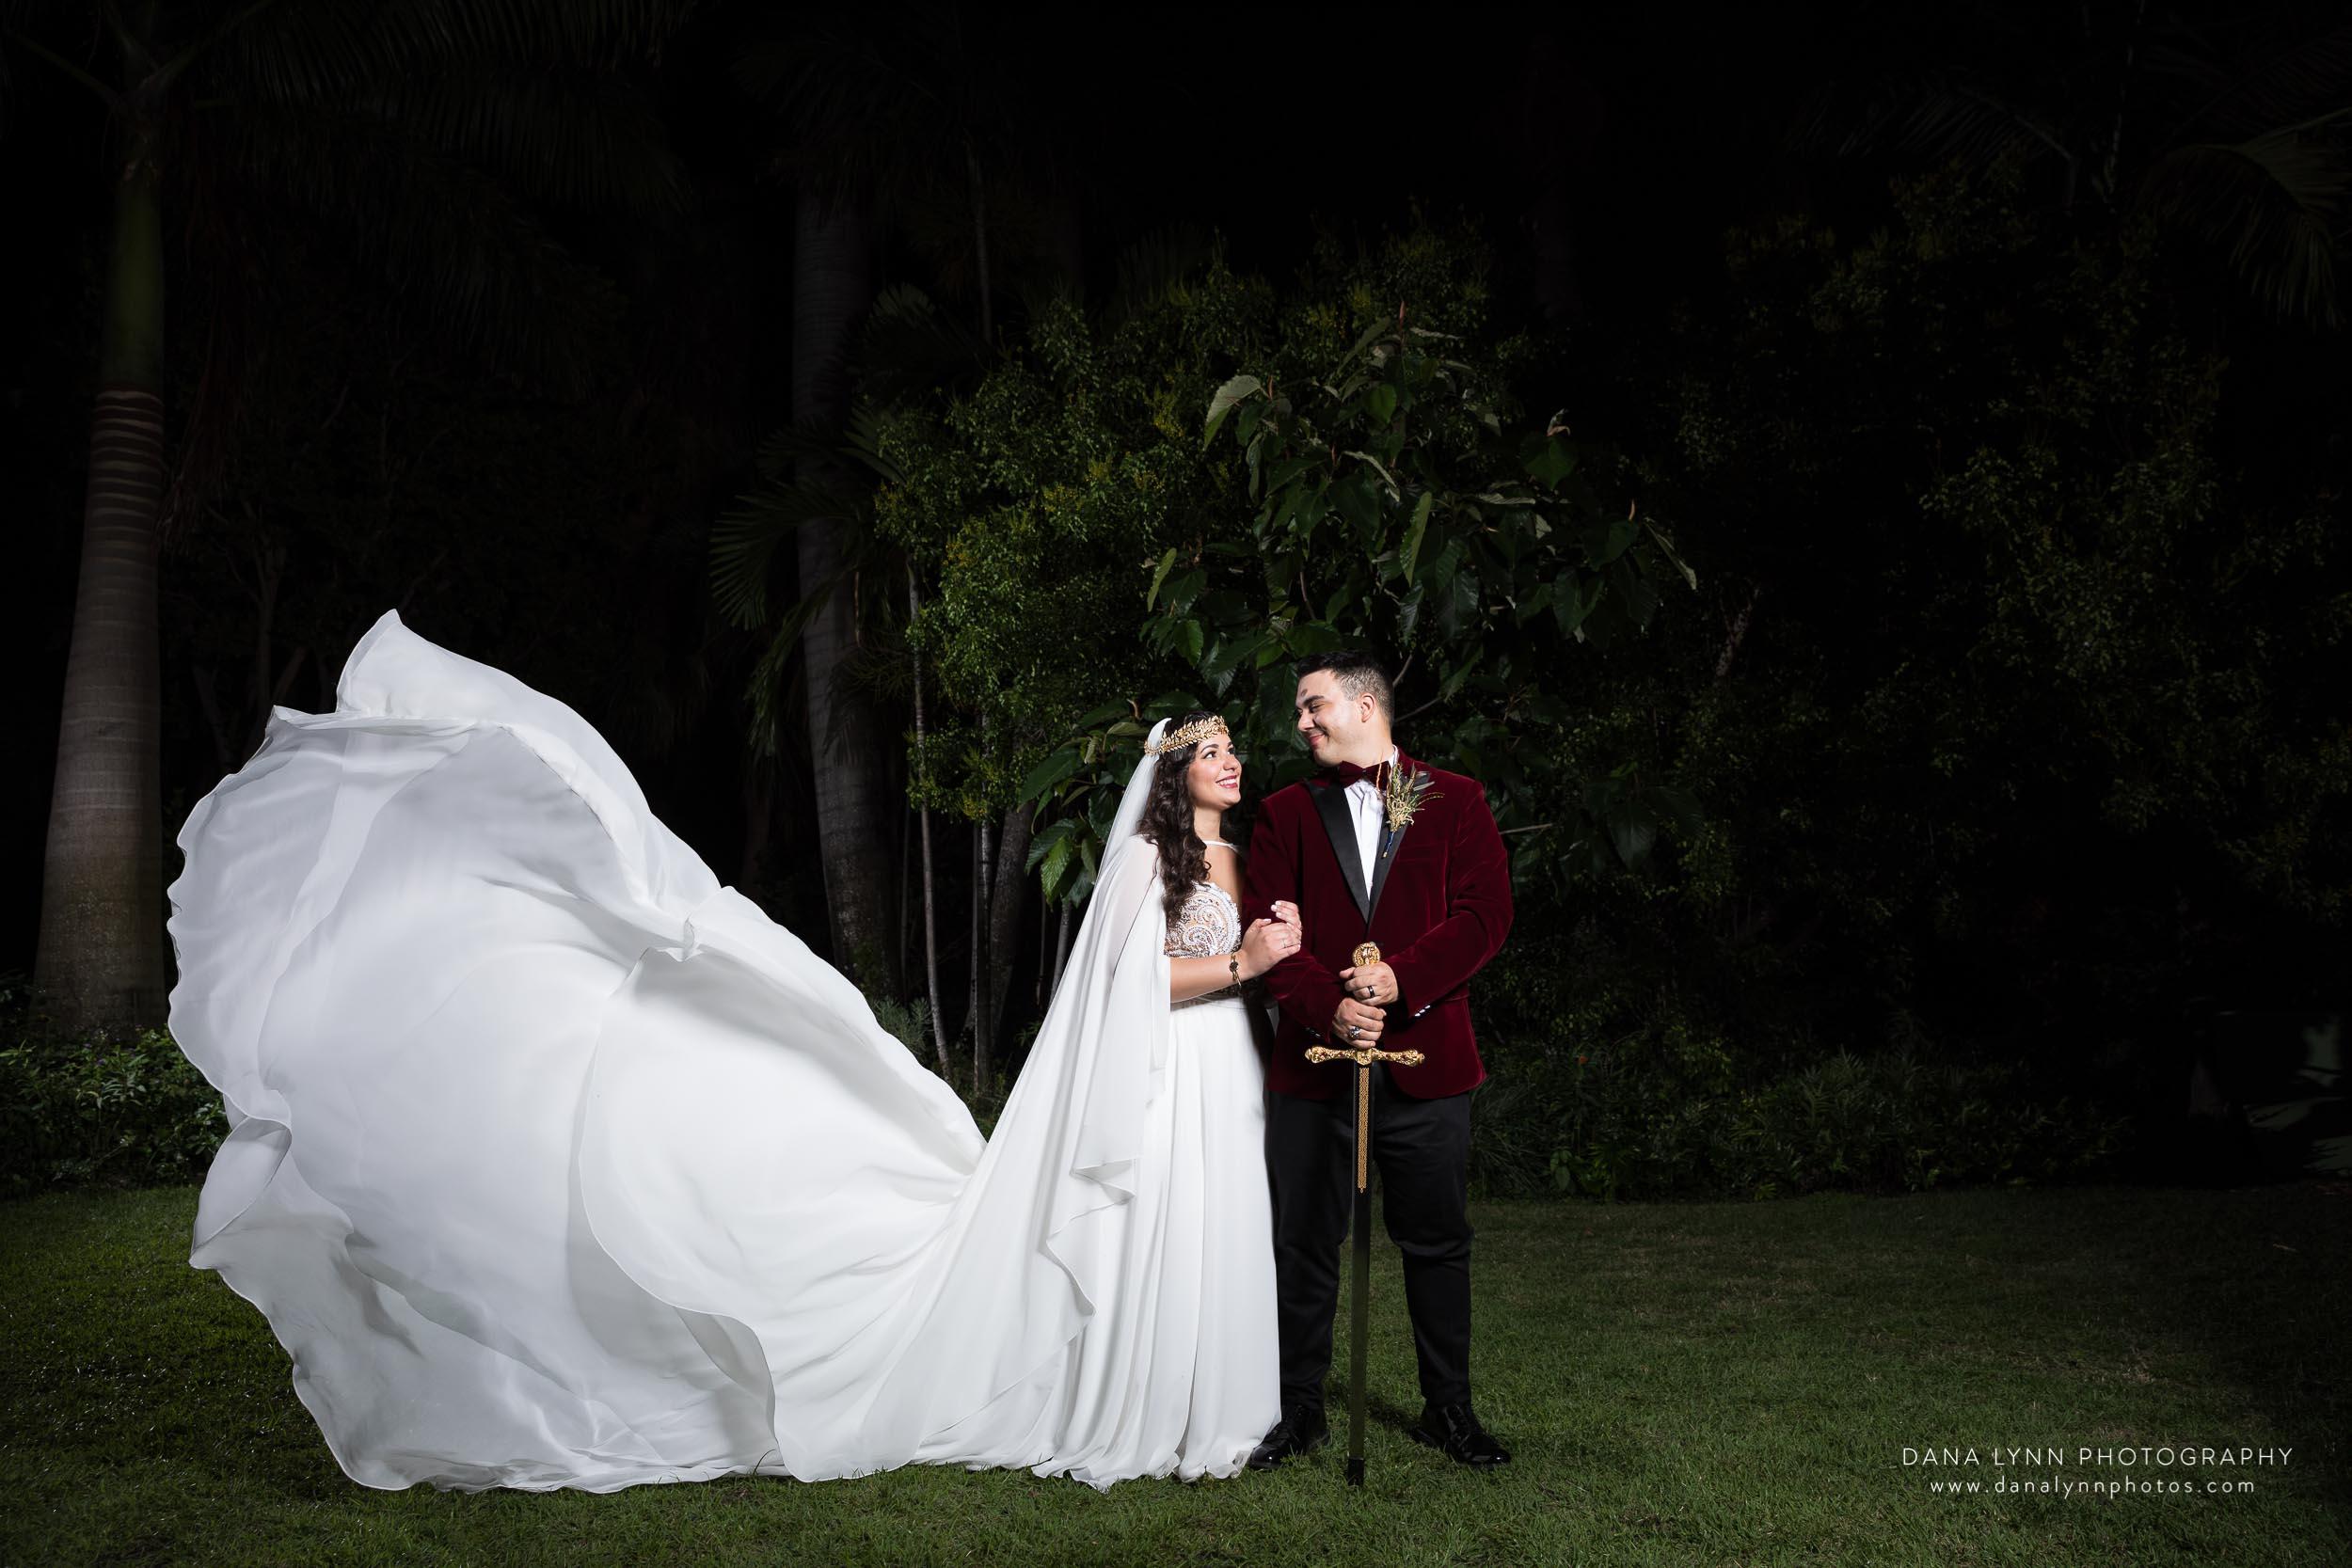 game-of-thrones-wedding-0007.jpg